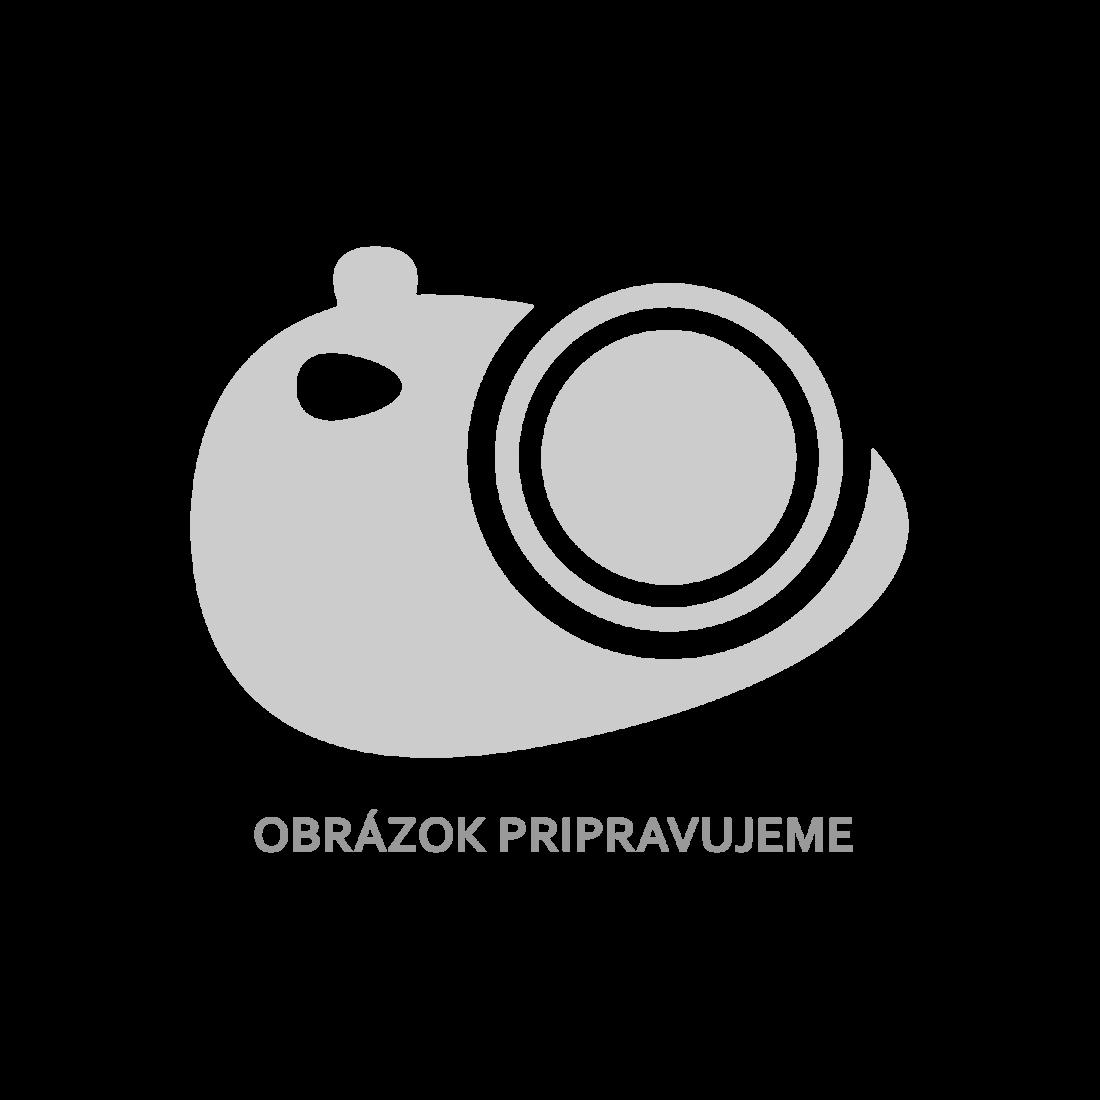 vidaXL Koupelnová skříňka šedá 30 x 30 x 183,5 cm dřevotříska [802671]